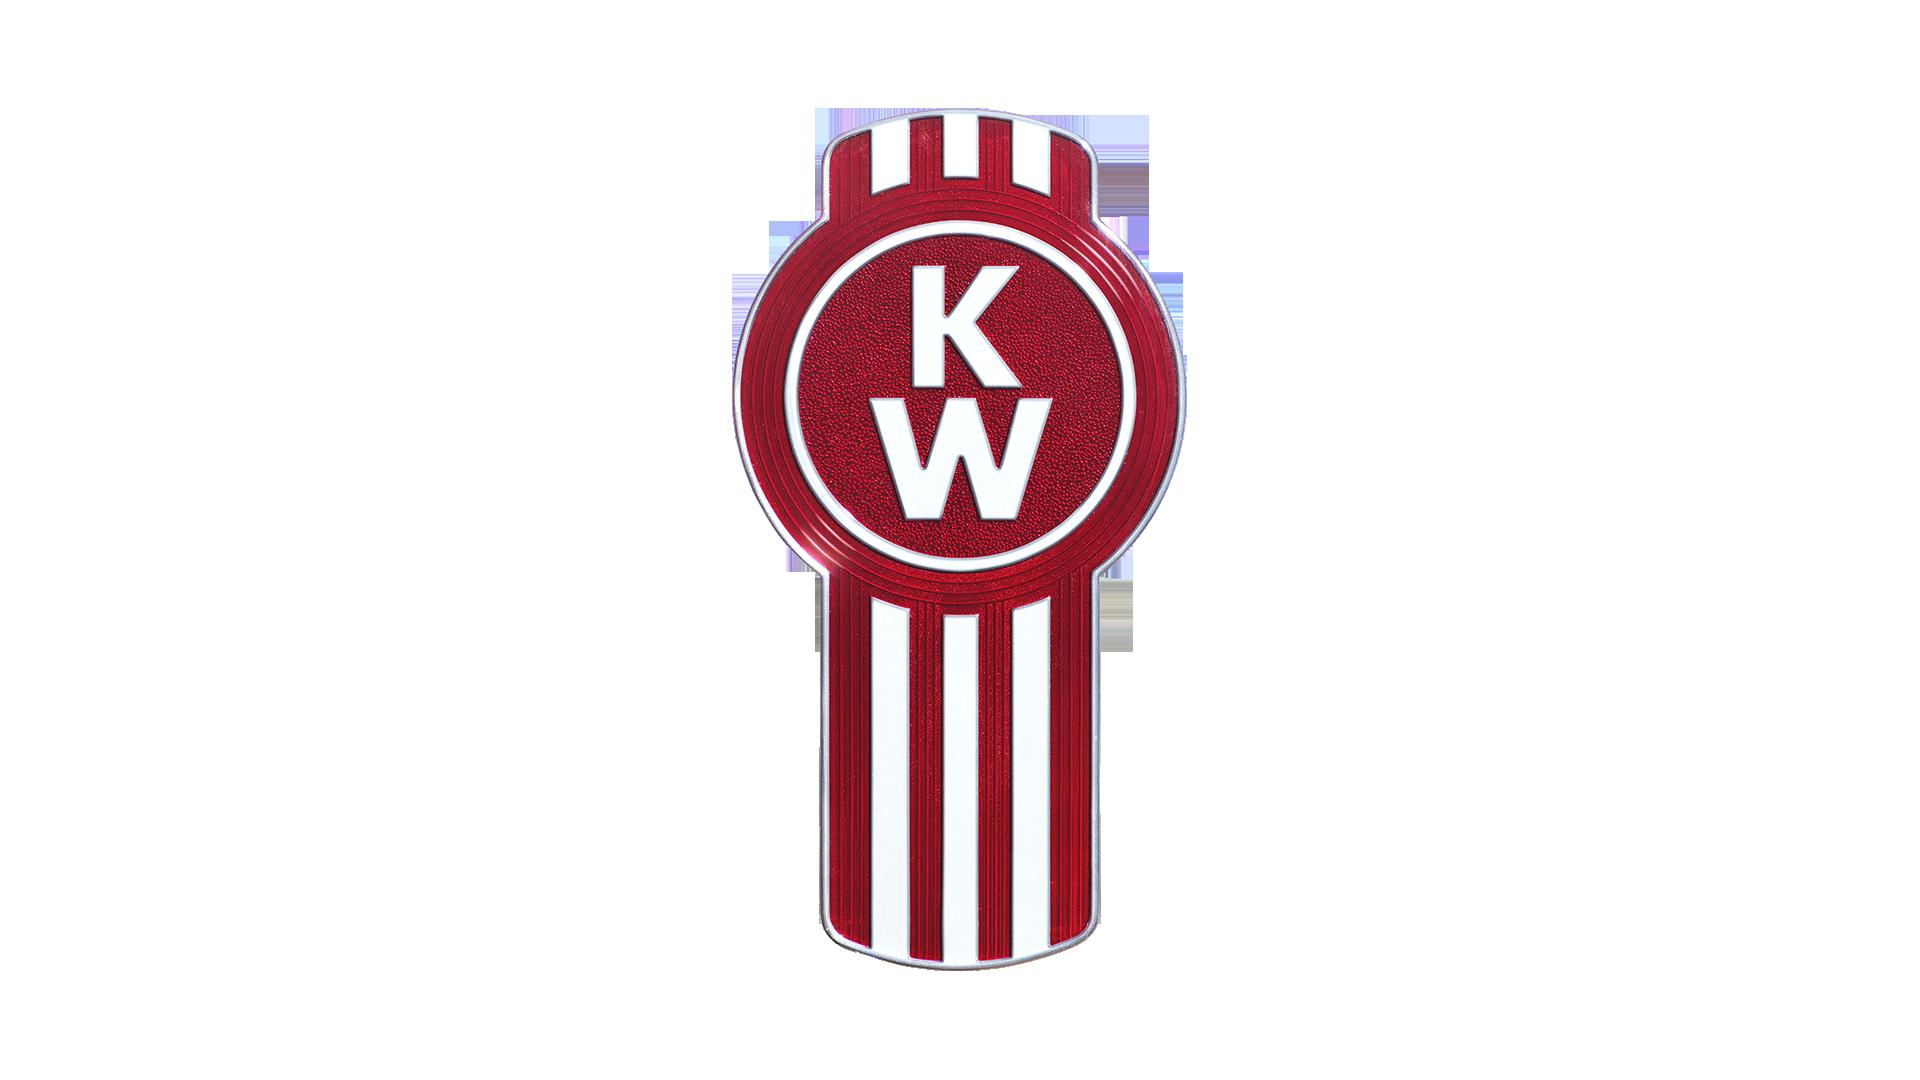 Kenworth Truck Logo, HD Png, Information.